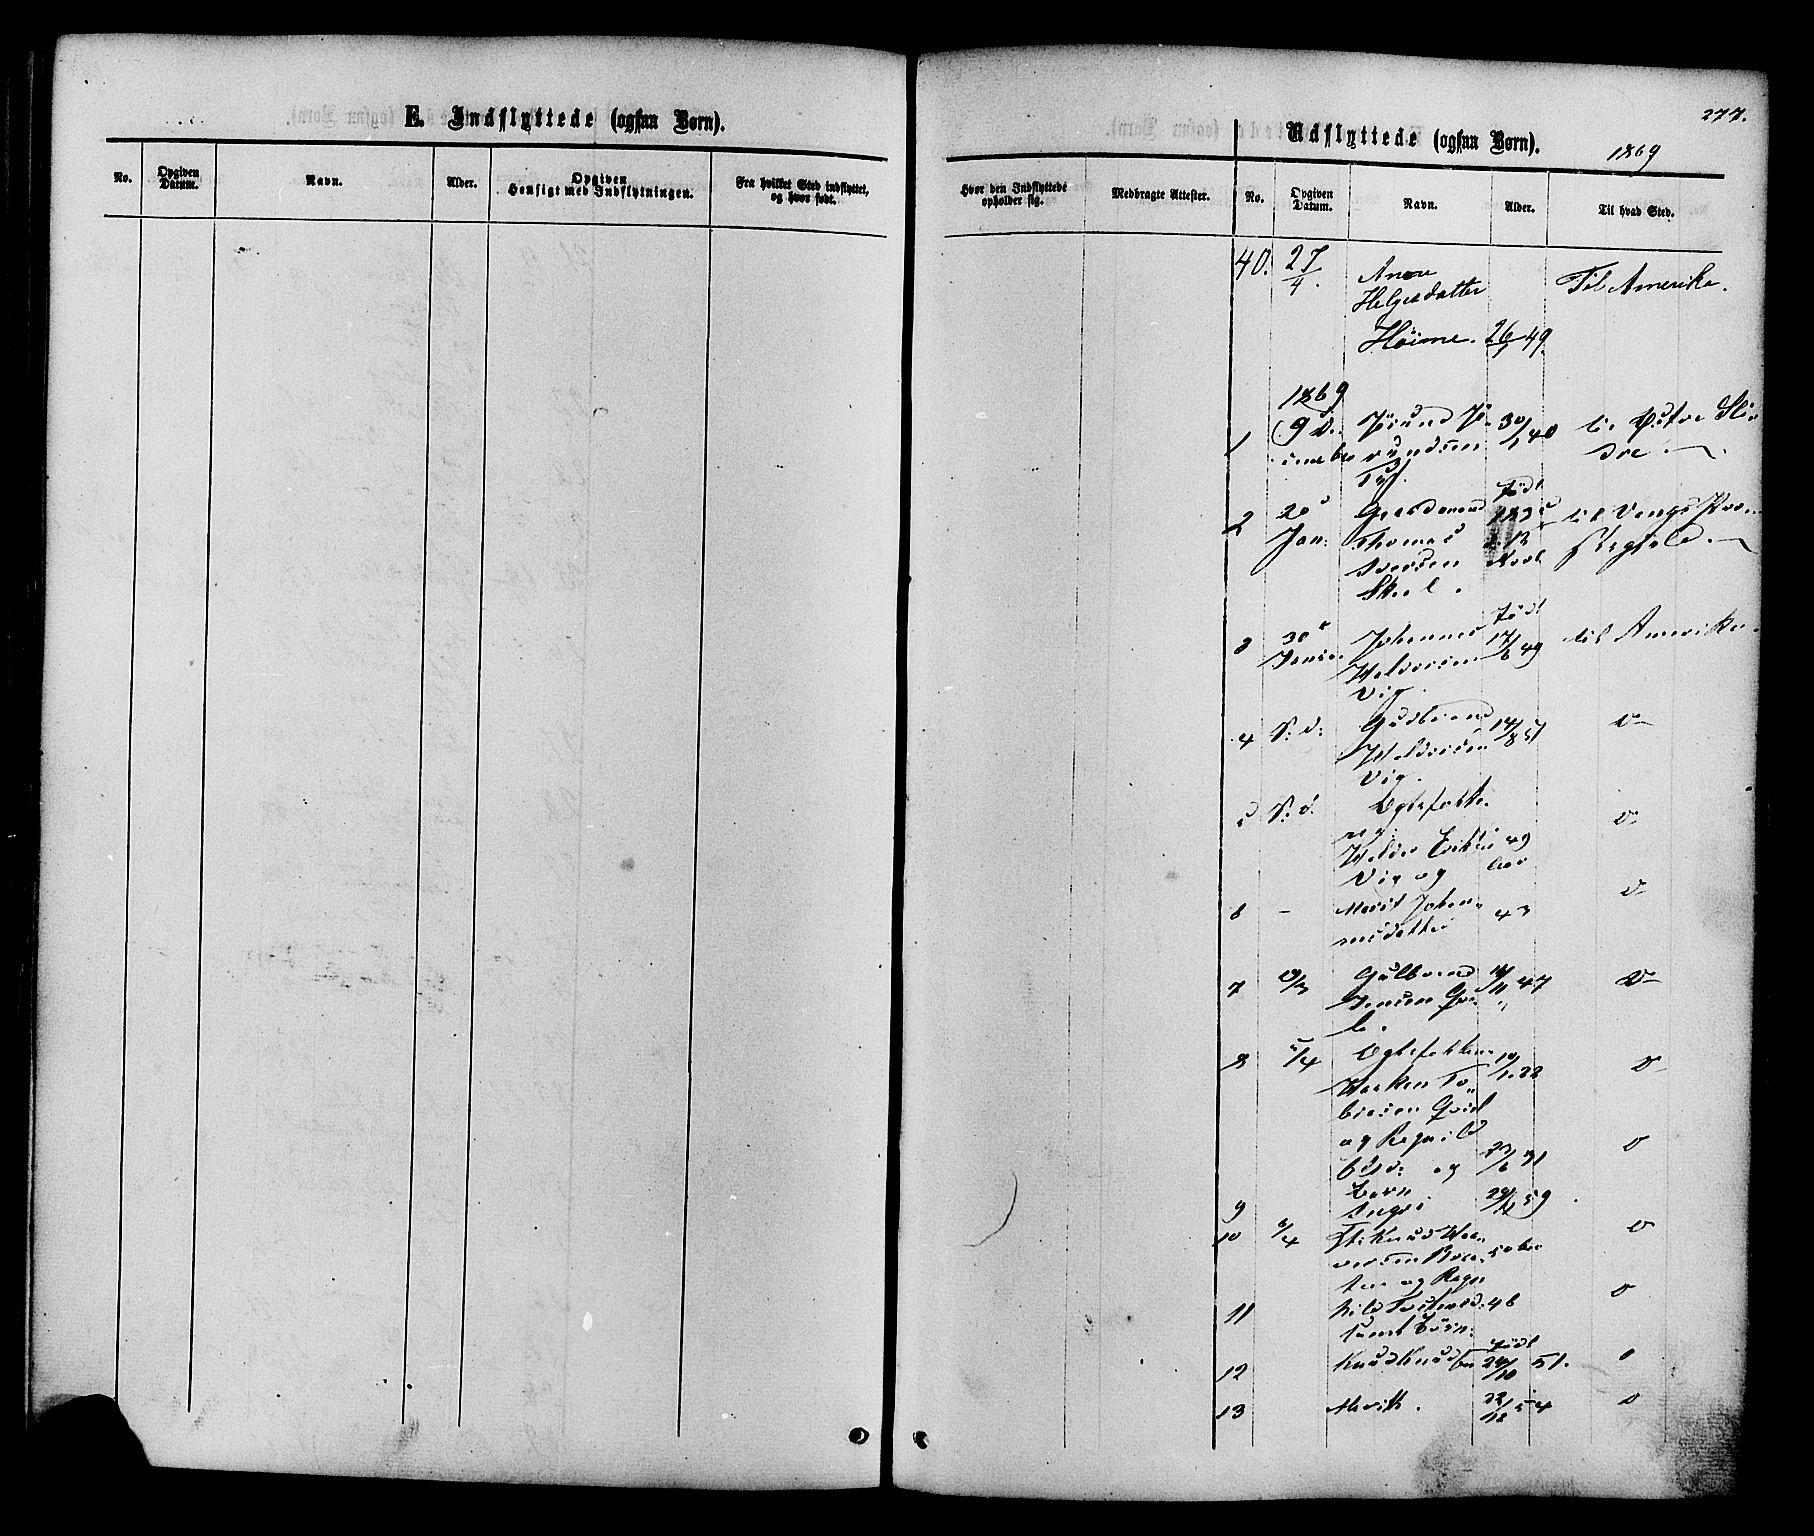 SAH, Vestre Slidre prestekontor, Ministerialbok nr. 3, 1865-1880, s. 277